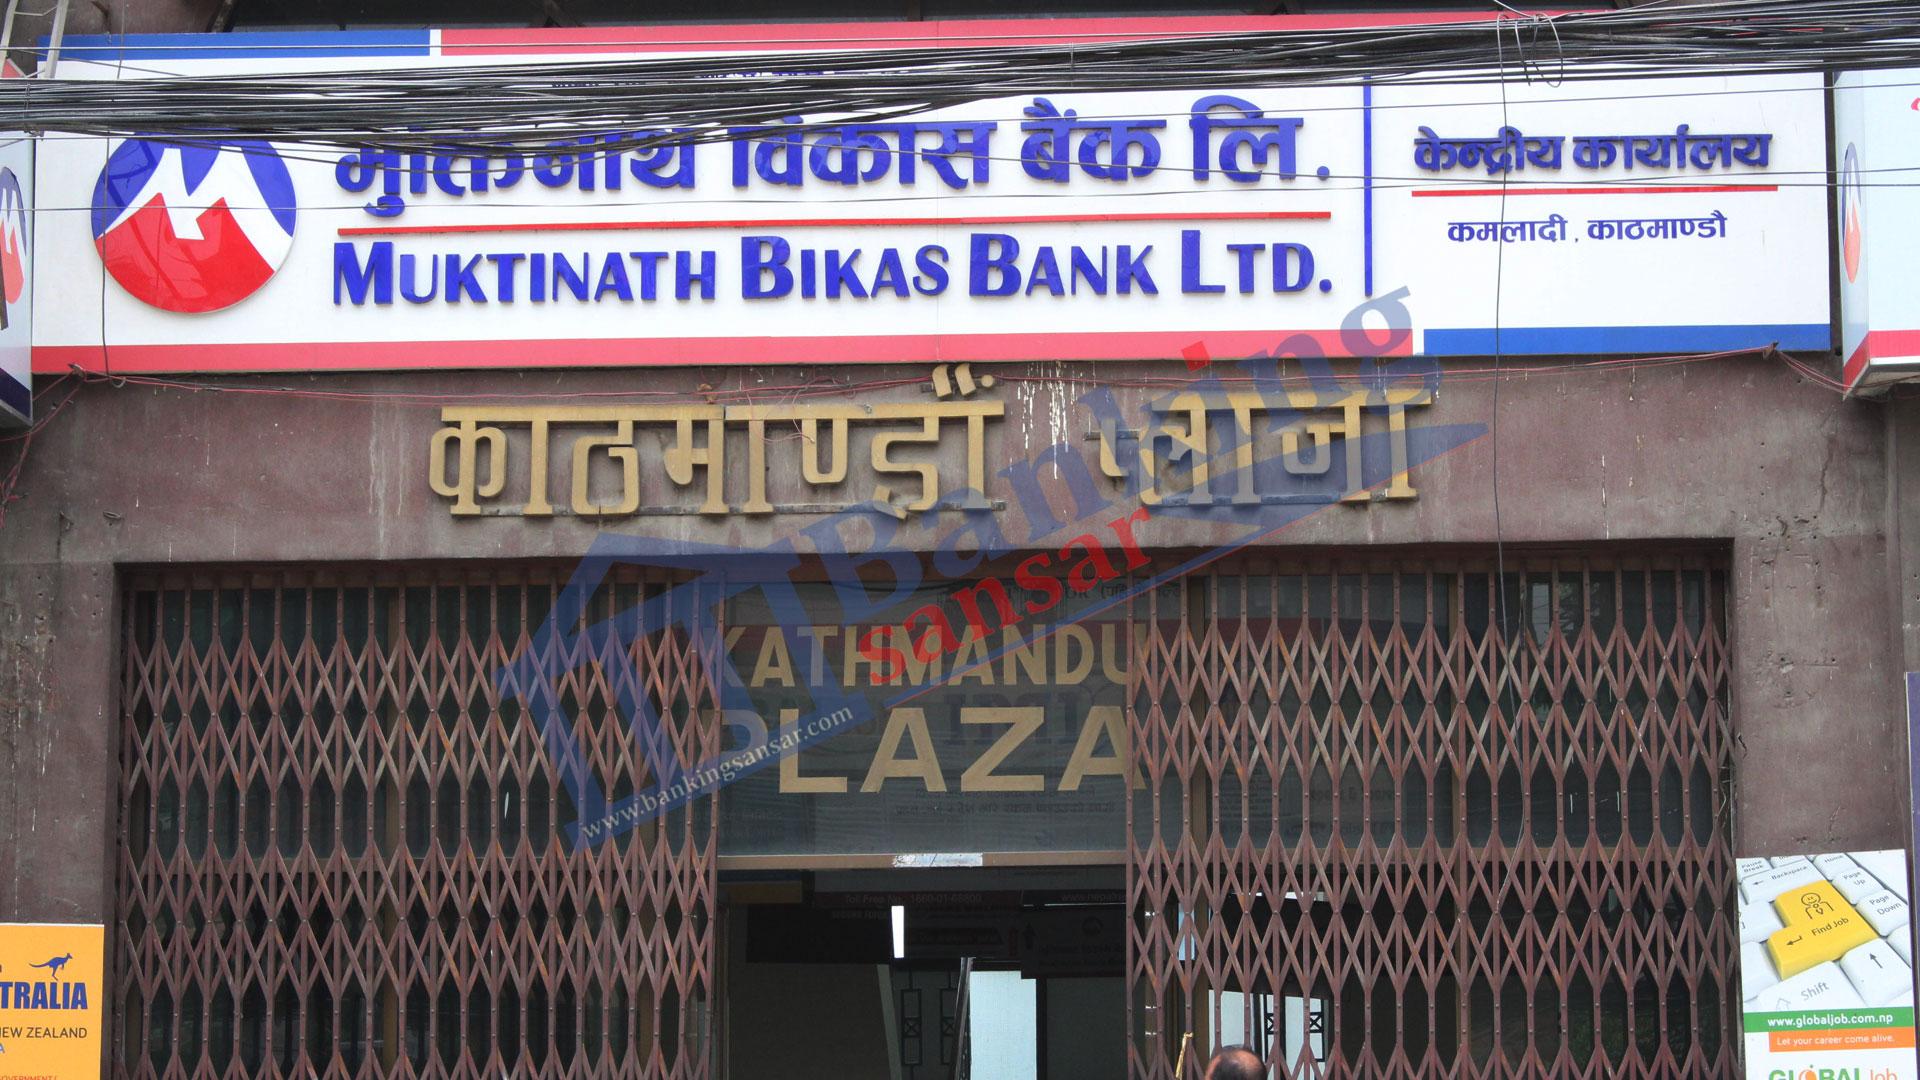 Muktinath Bikas Bank